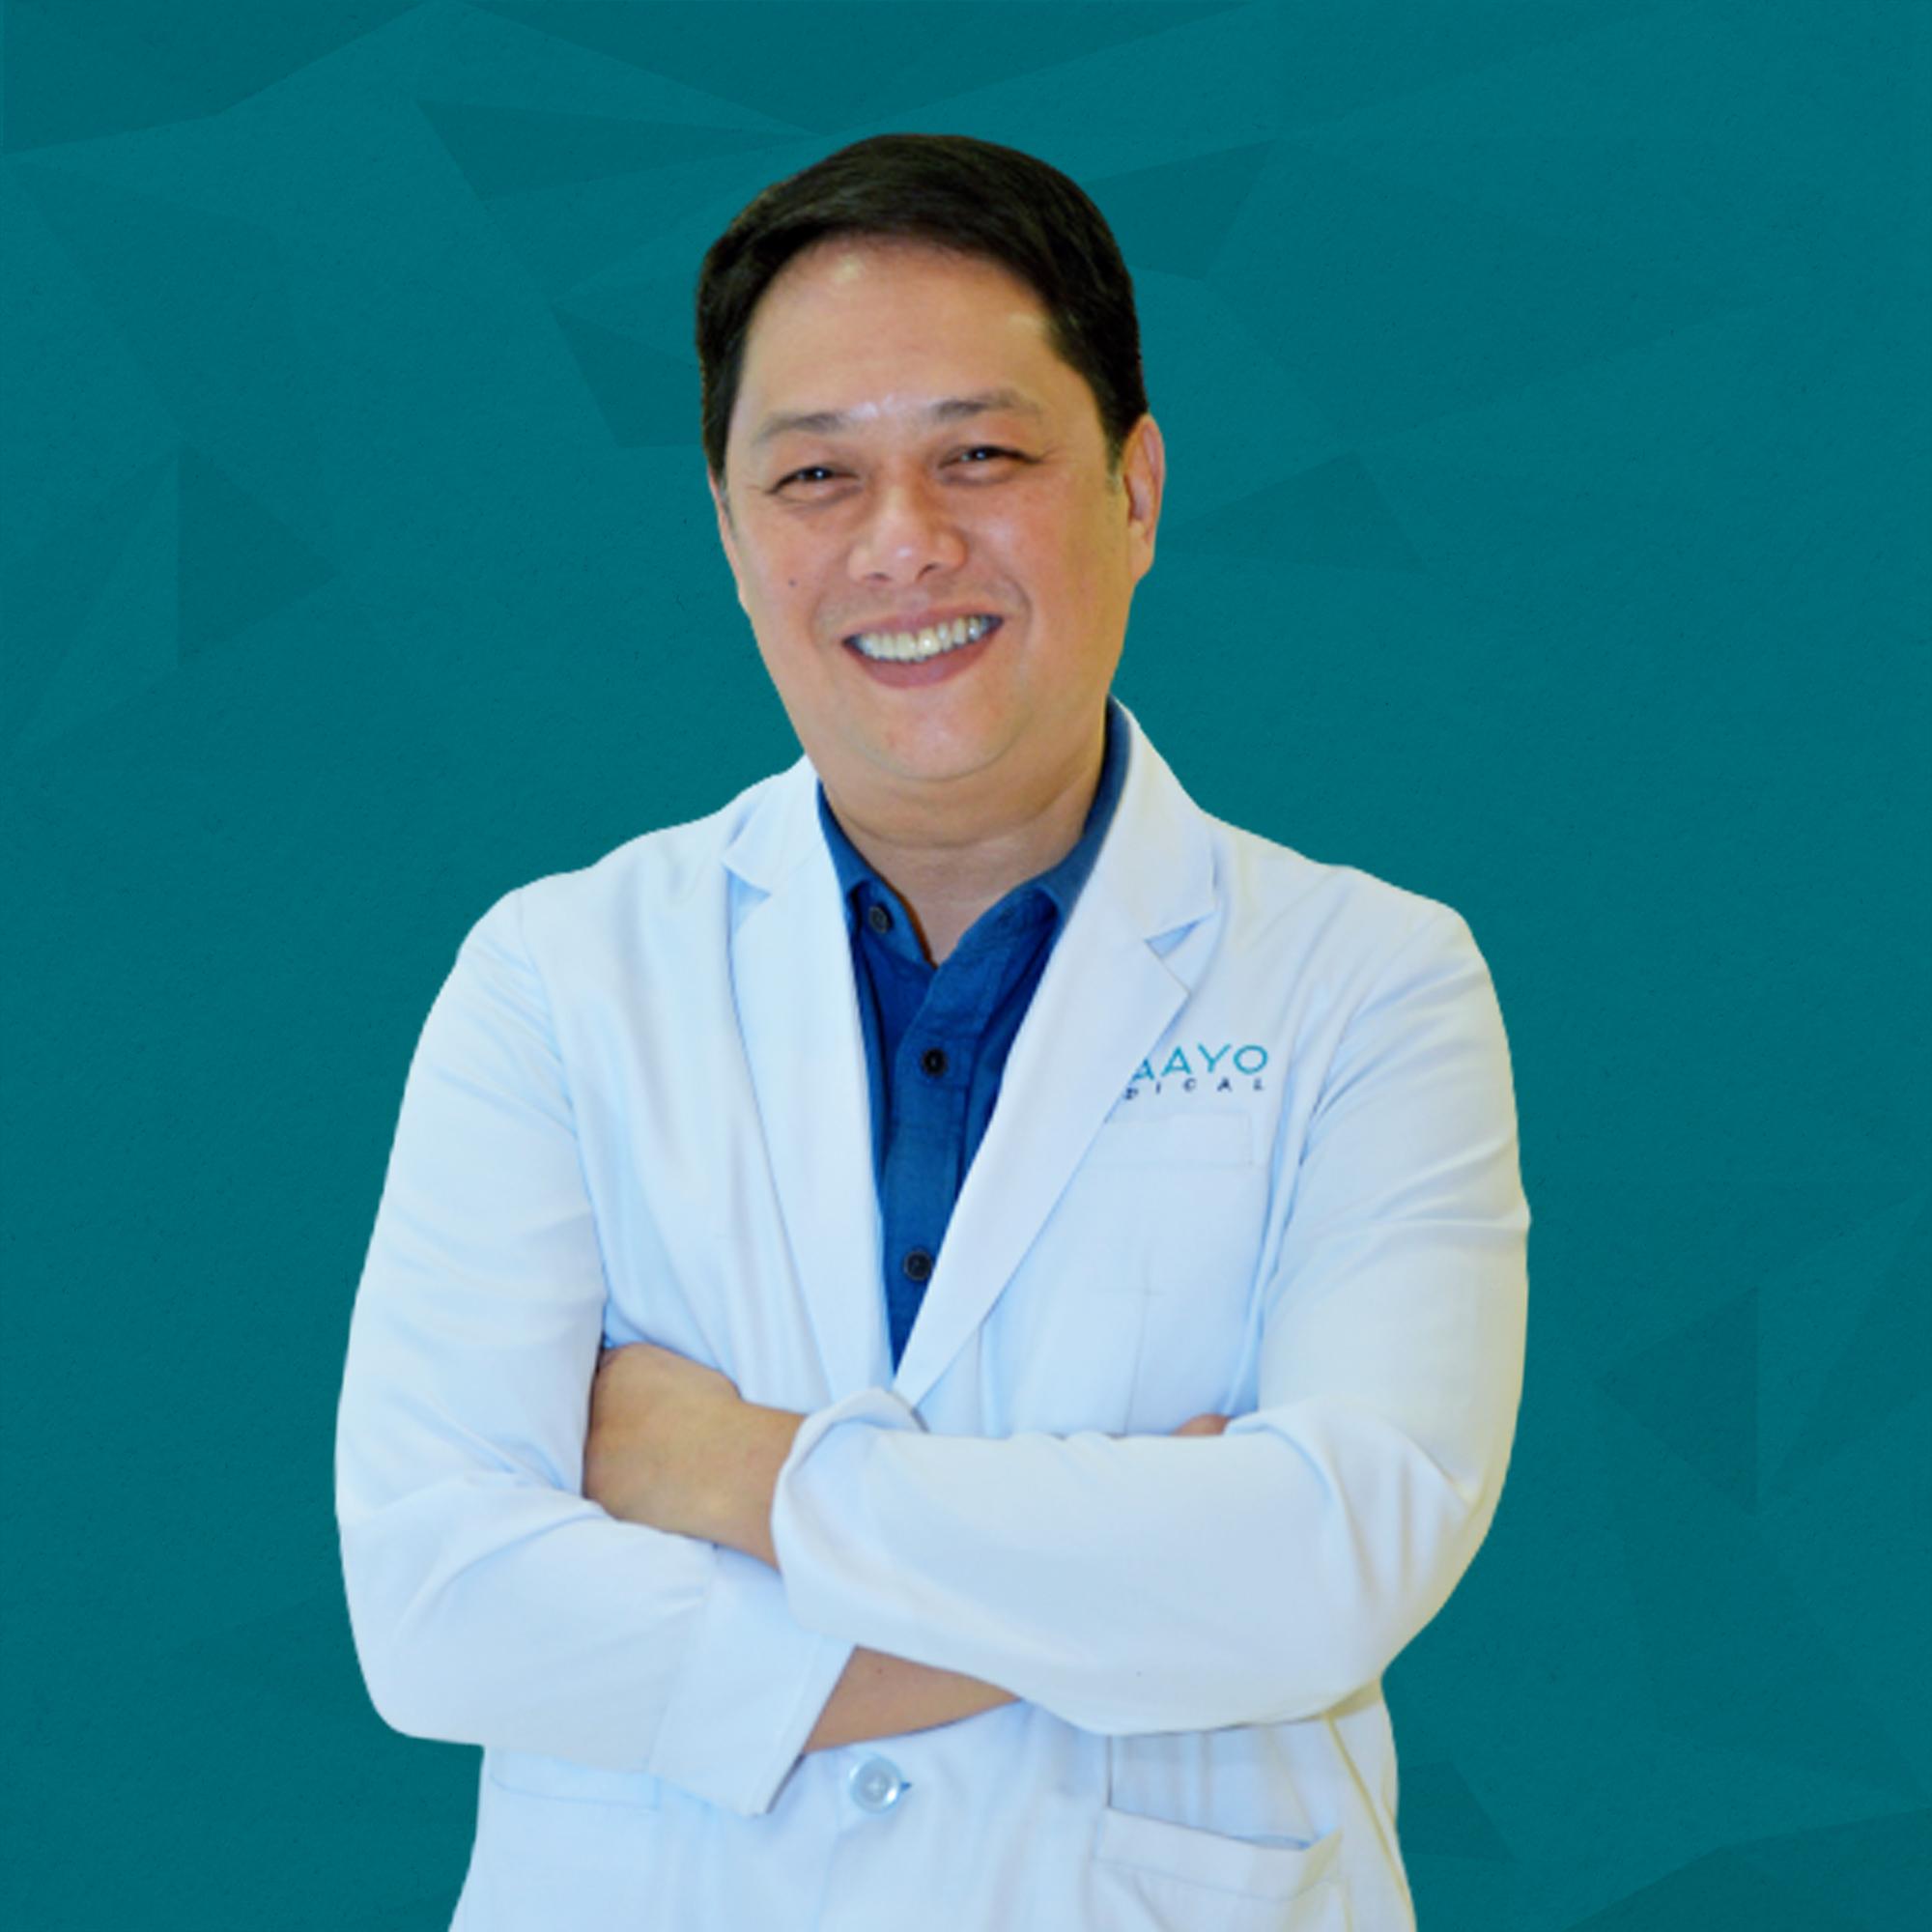 Dr. Borromeo, Jose Daniel